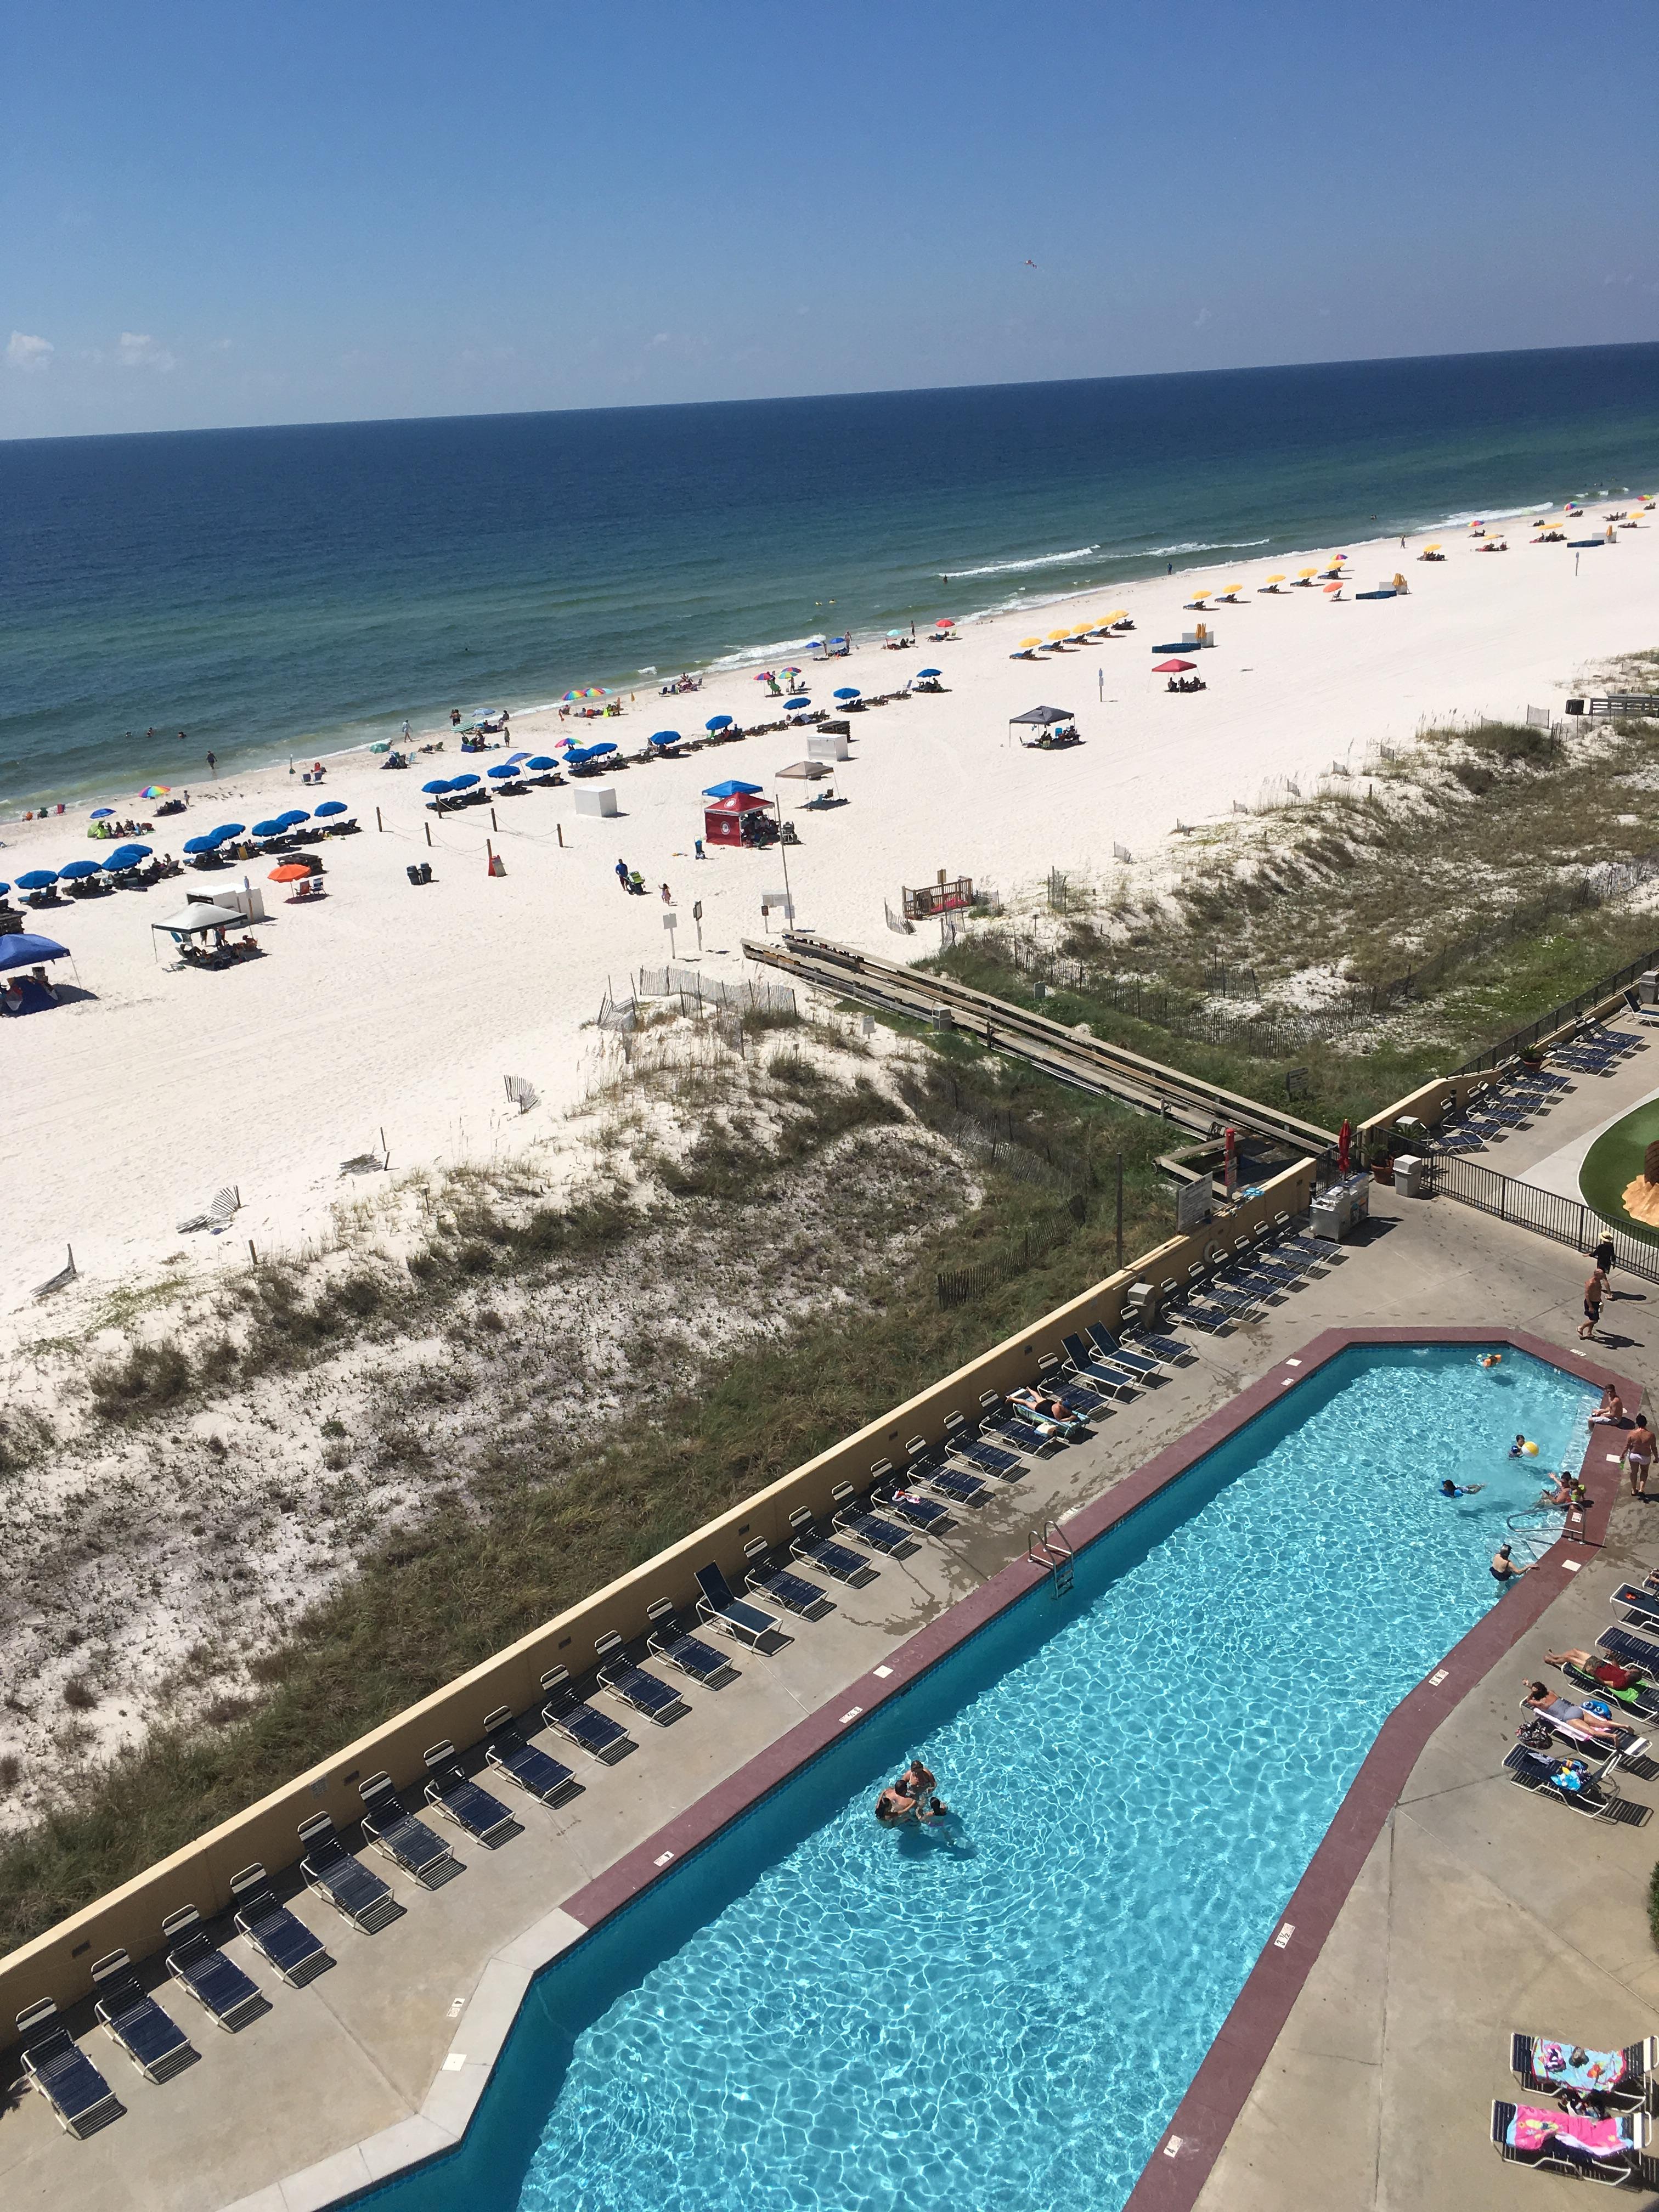 Gulf Shores And Orange Beach: Adventure, Fun & Relaxation